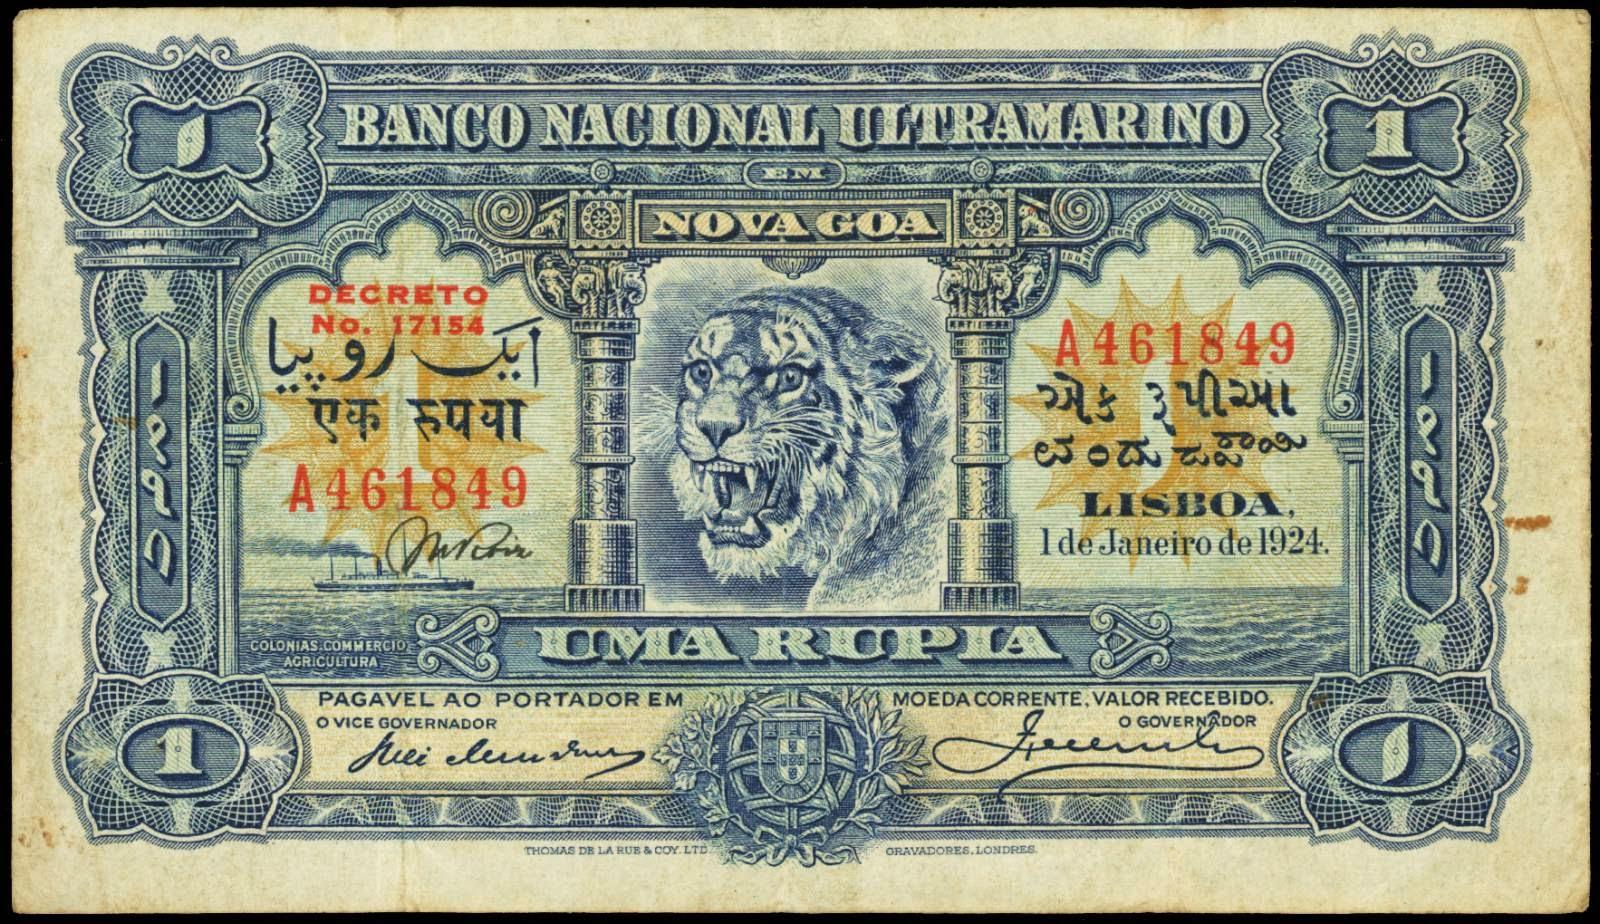 Portuguese Indian rupia banknote 1924 Tiger Banco Nacional Ultramarino, Nova Goa